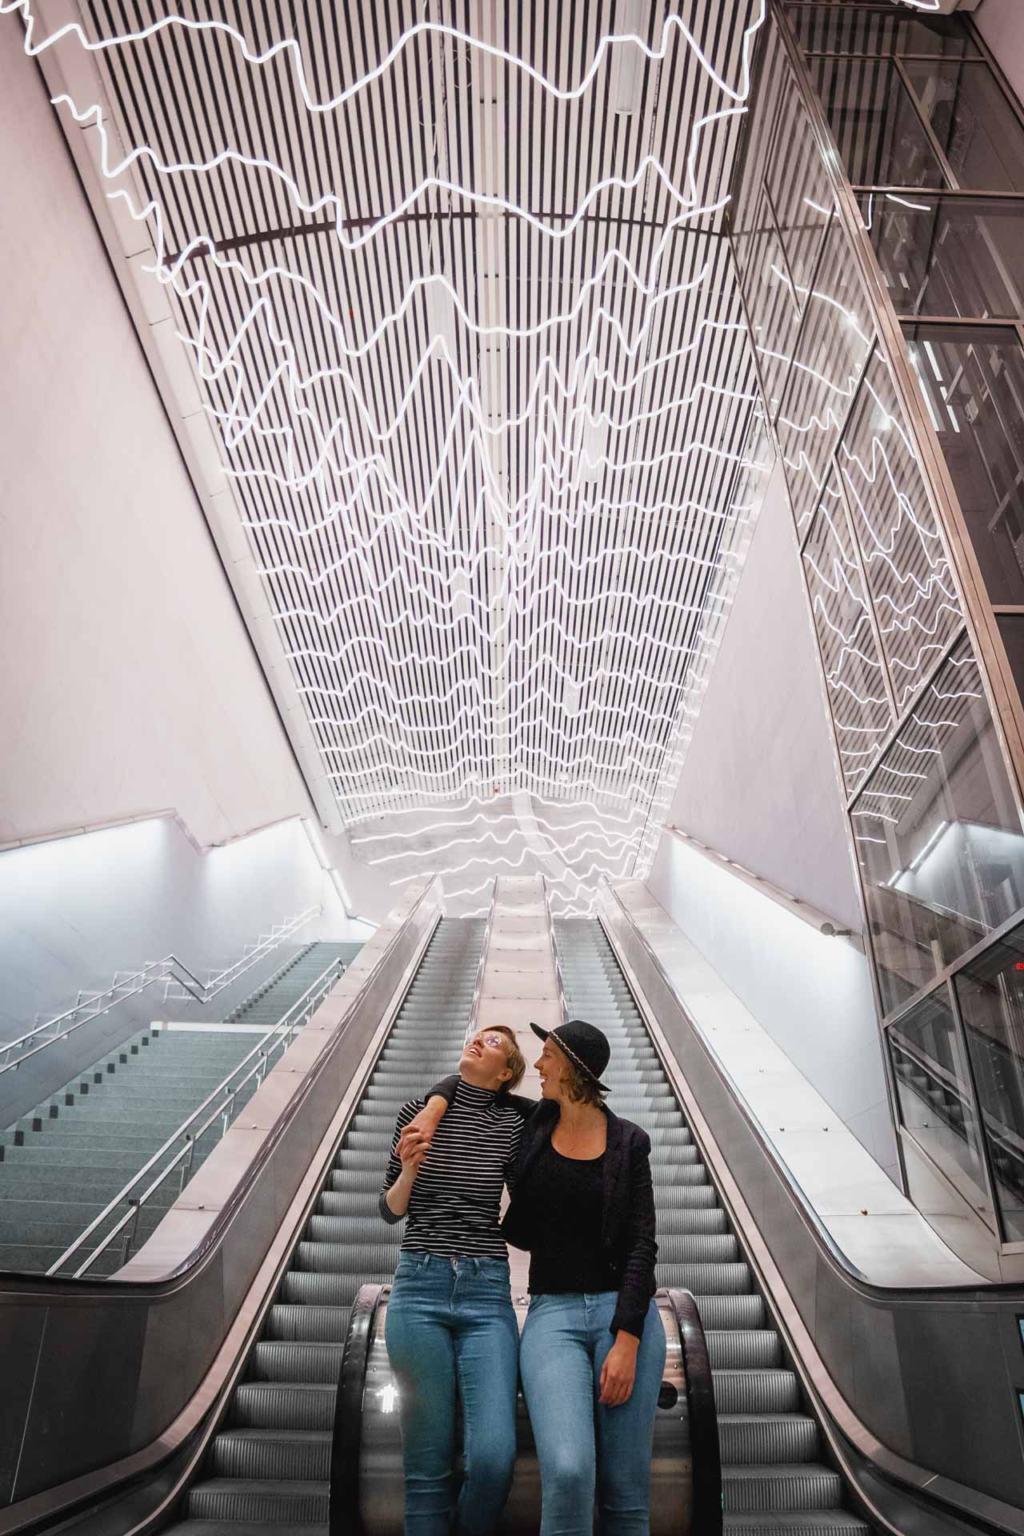 Stockholm Metro Art, T-bana, Odenplan station, heartbeat